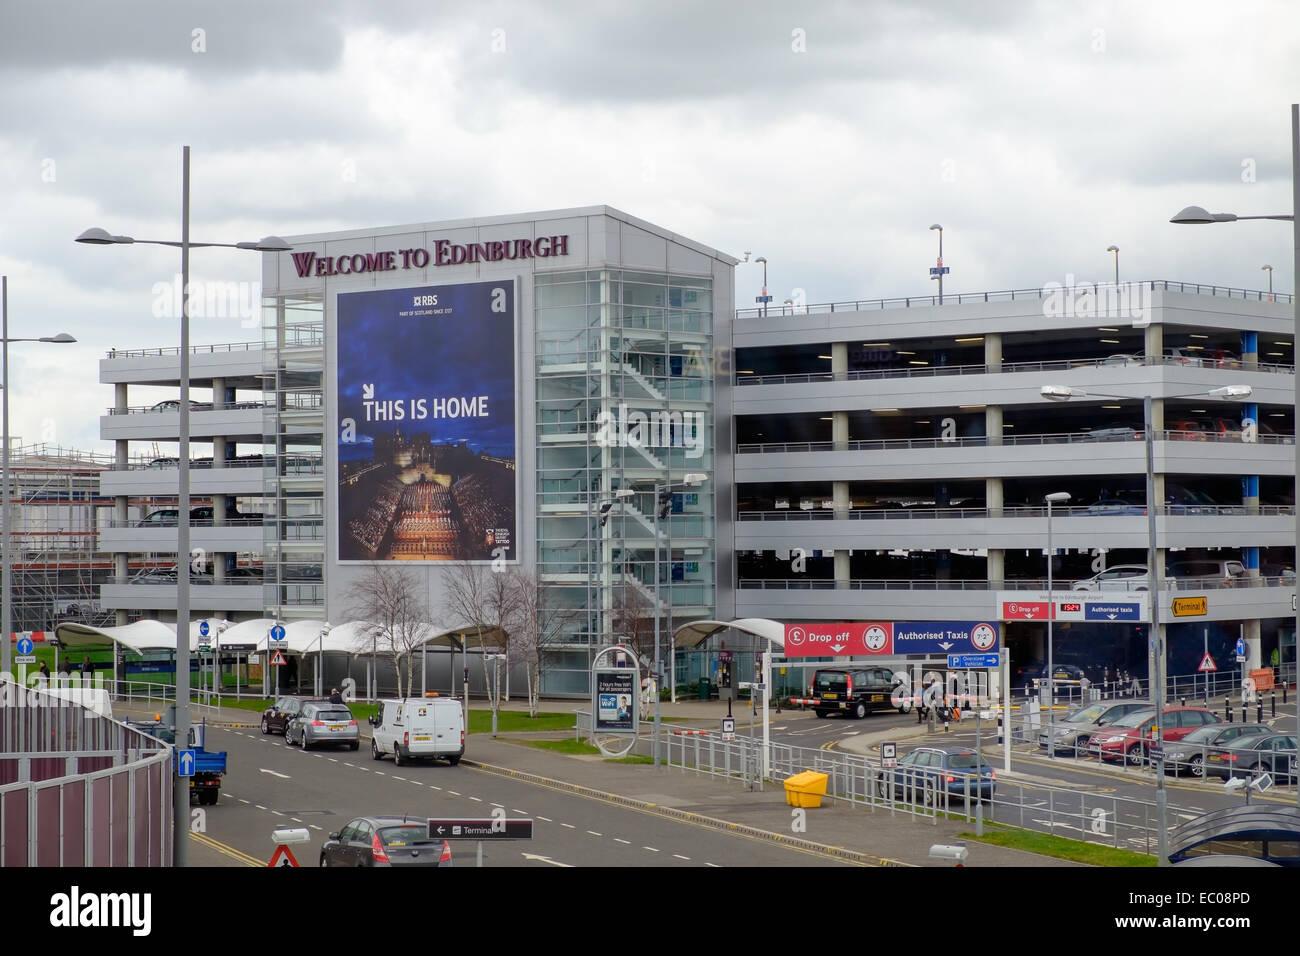 The multistory car park at Edinburgh Airport, Scotland. - Stock Image